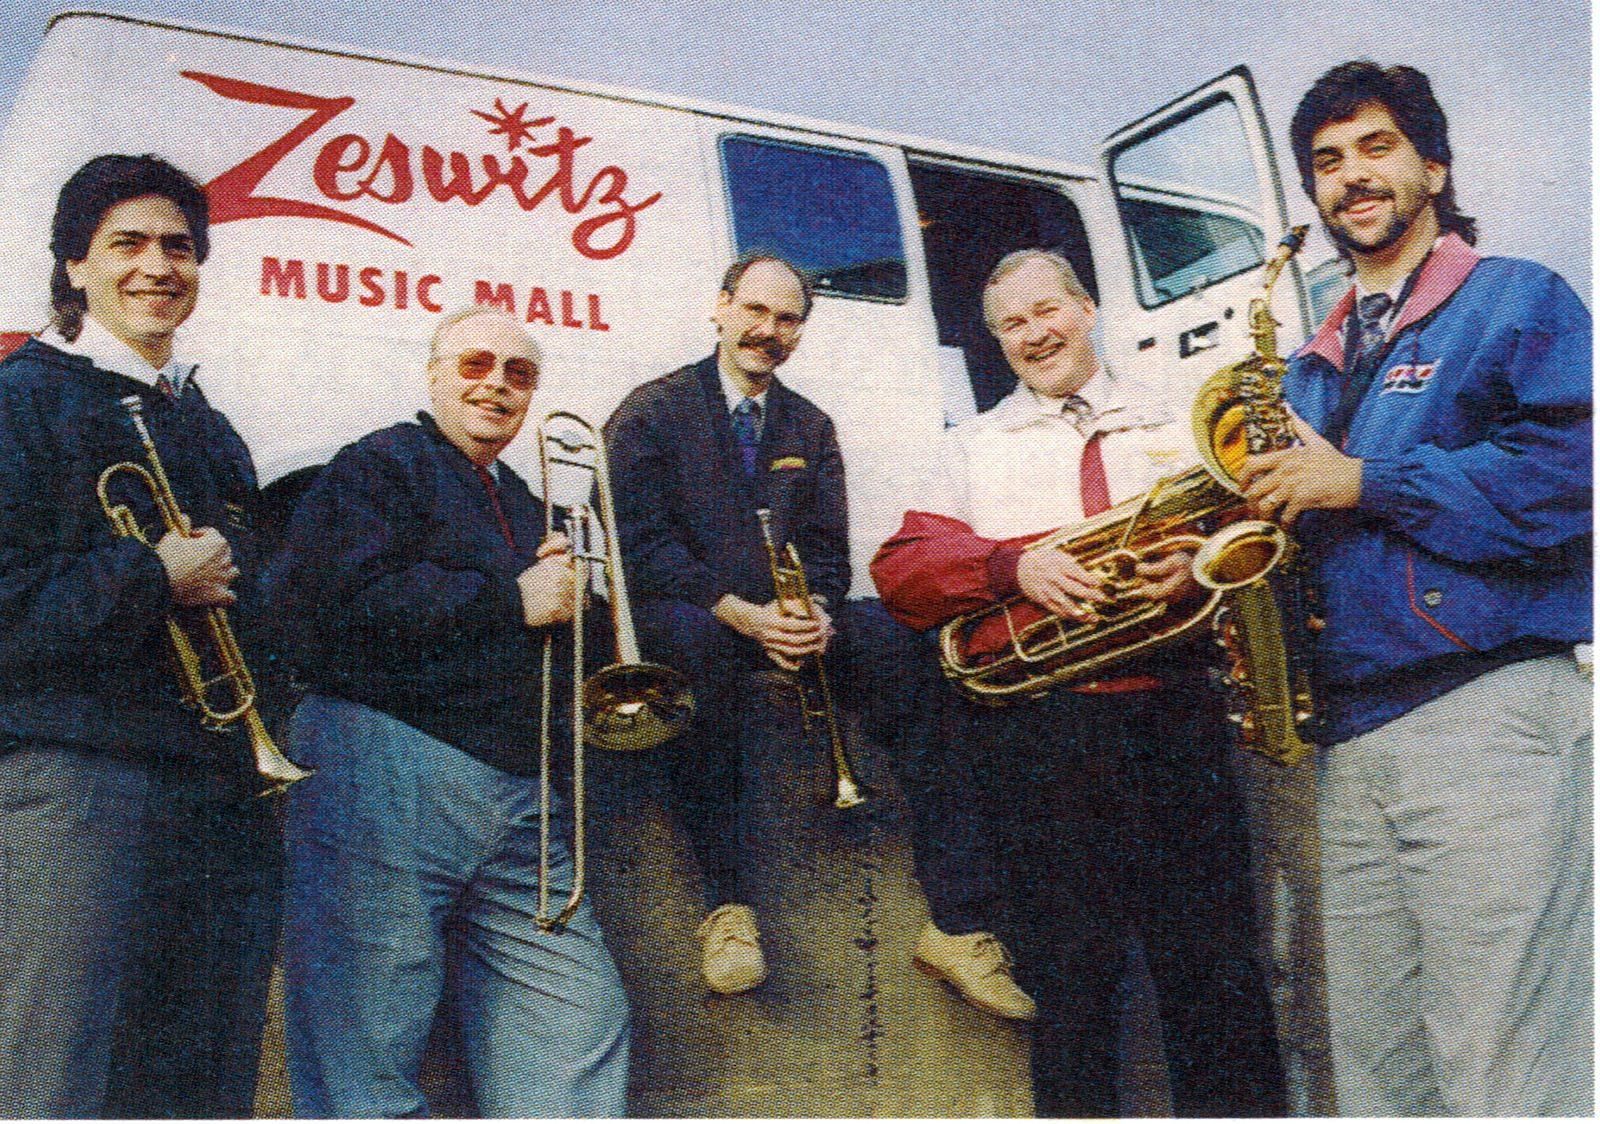 Zeswitz Education Representativesin the Early1990s